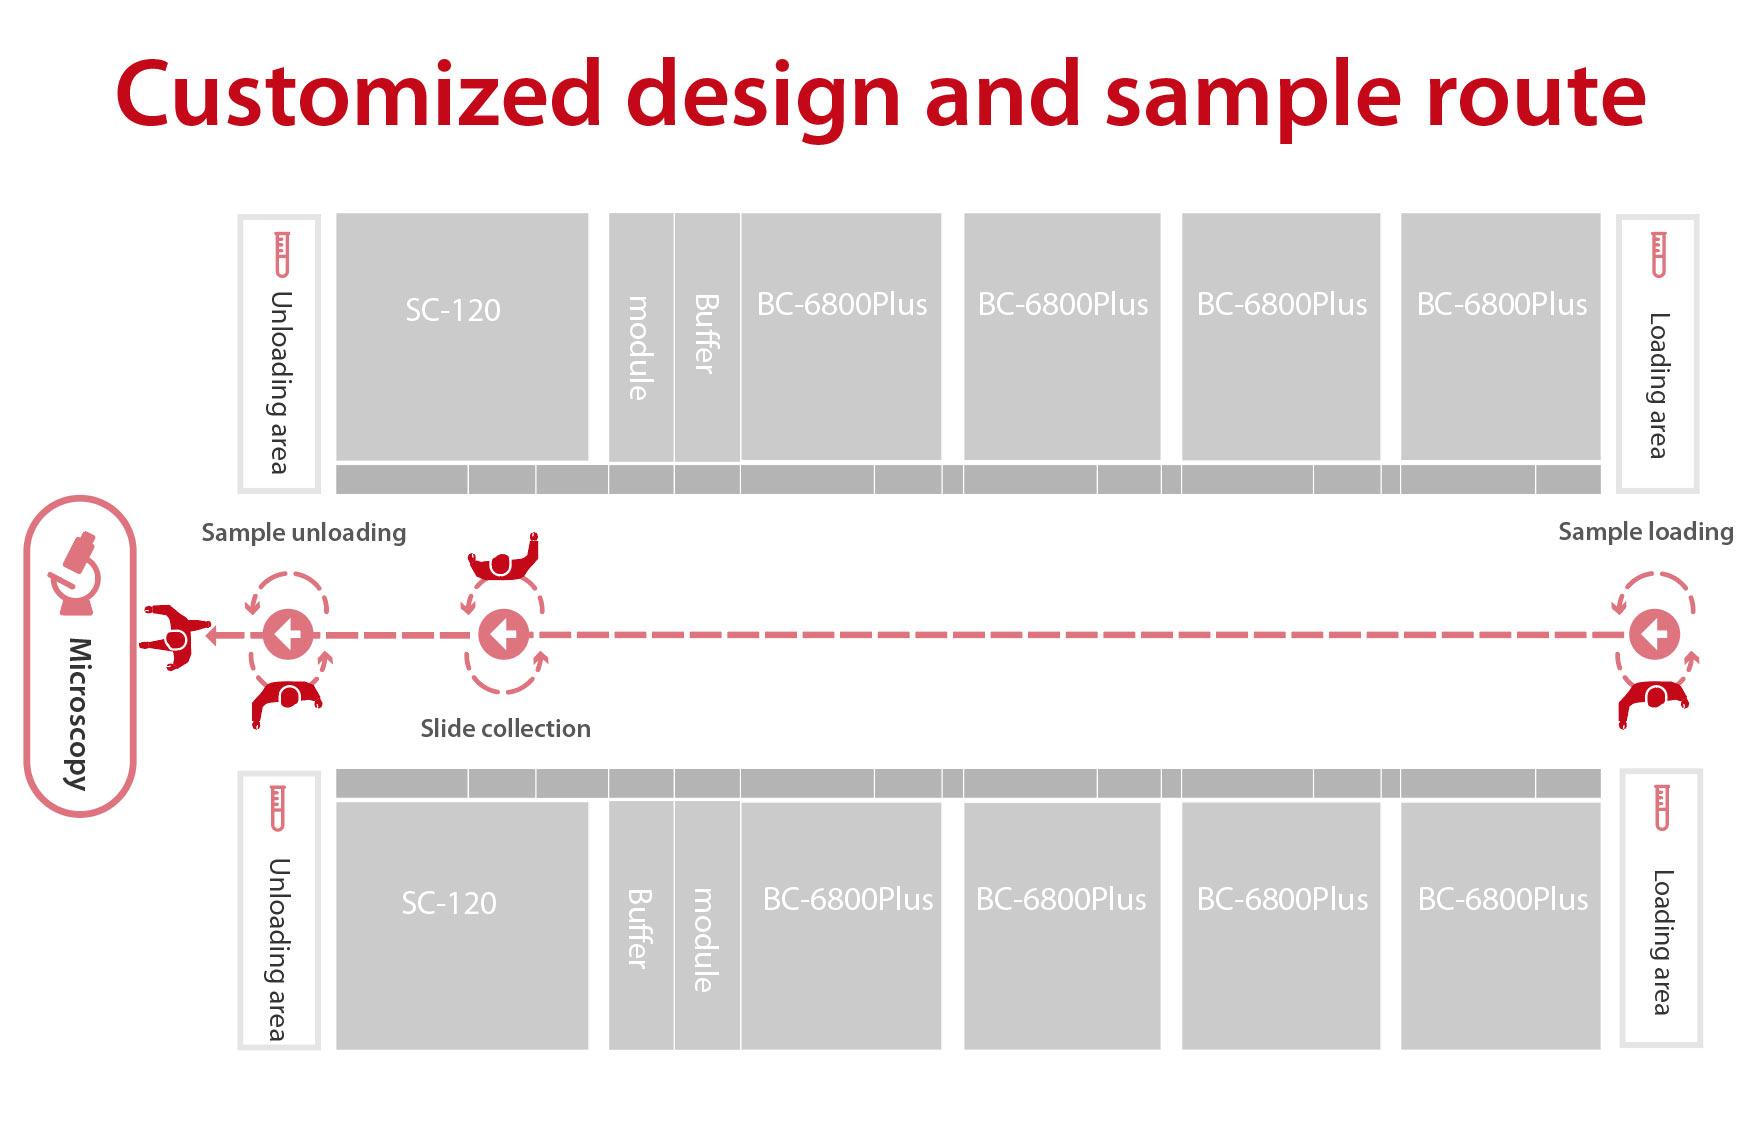 Image: Routes optimisation - Customized design and sample route(Photo courtesy of Mindray)